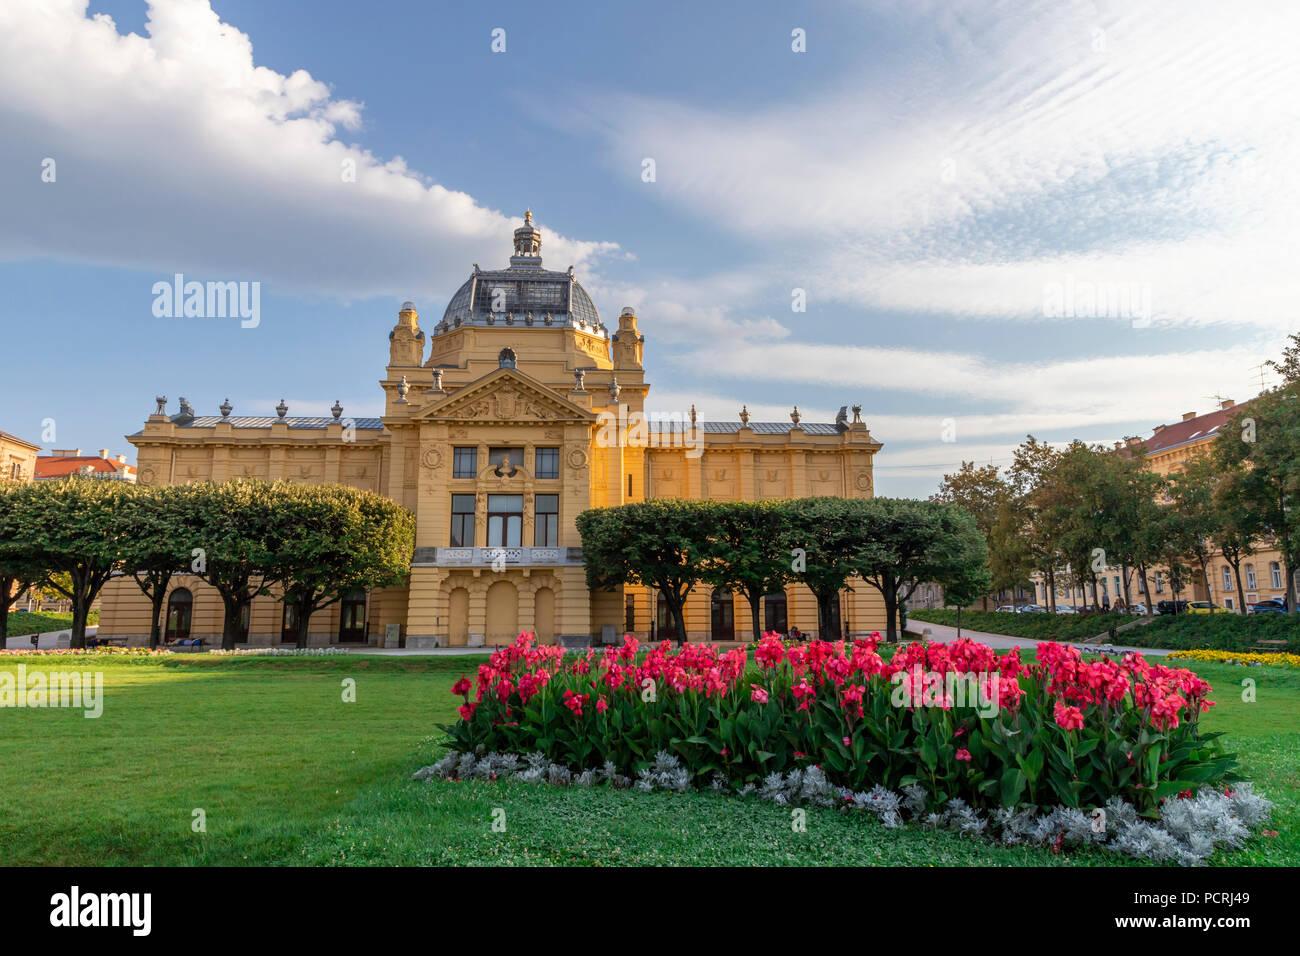 King Tomislav park in Zagreb on a sunny day Stock Photo